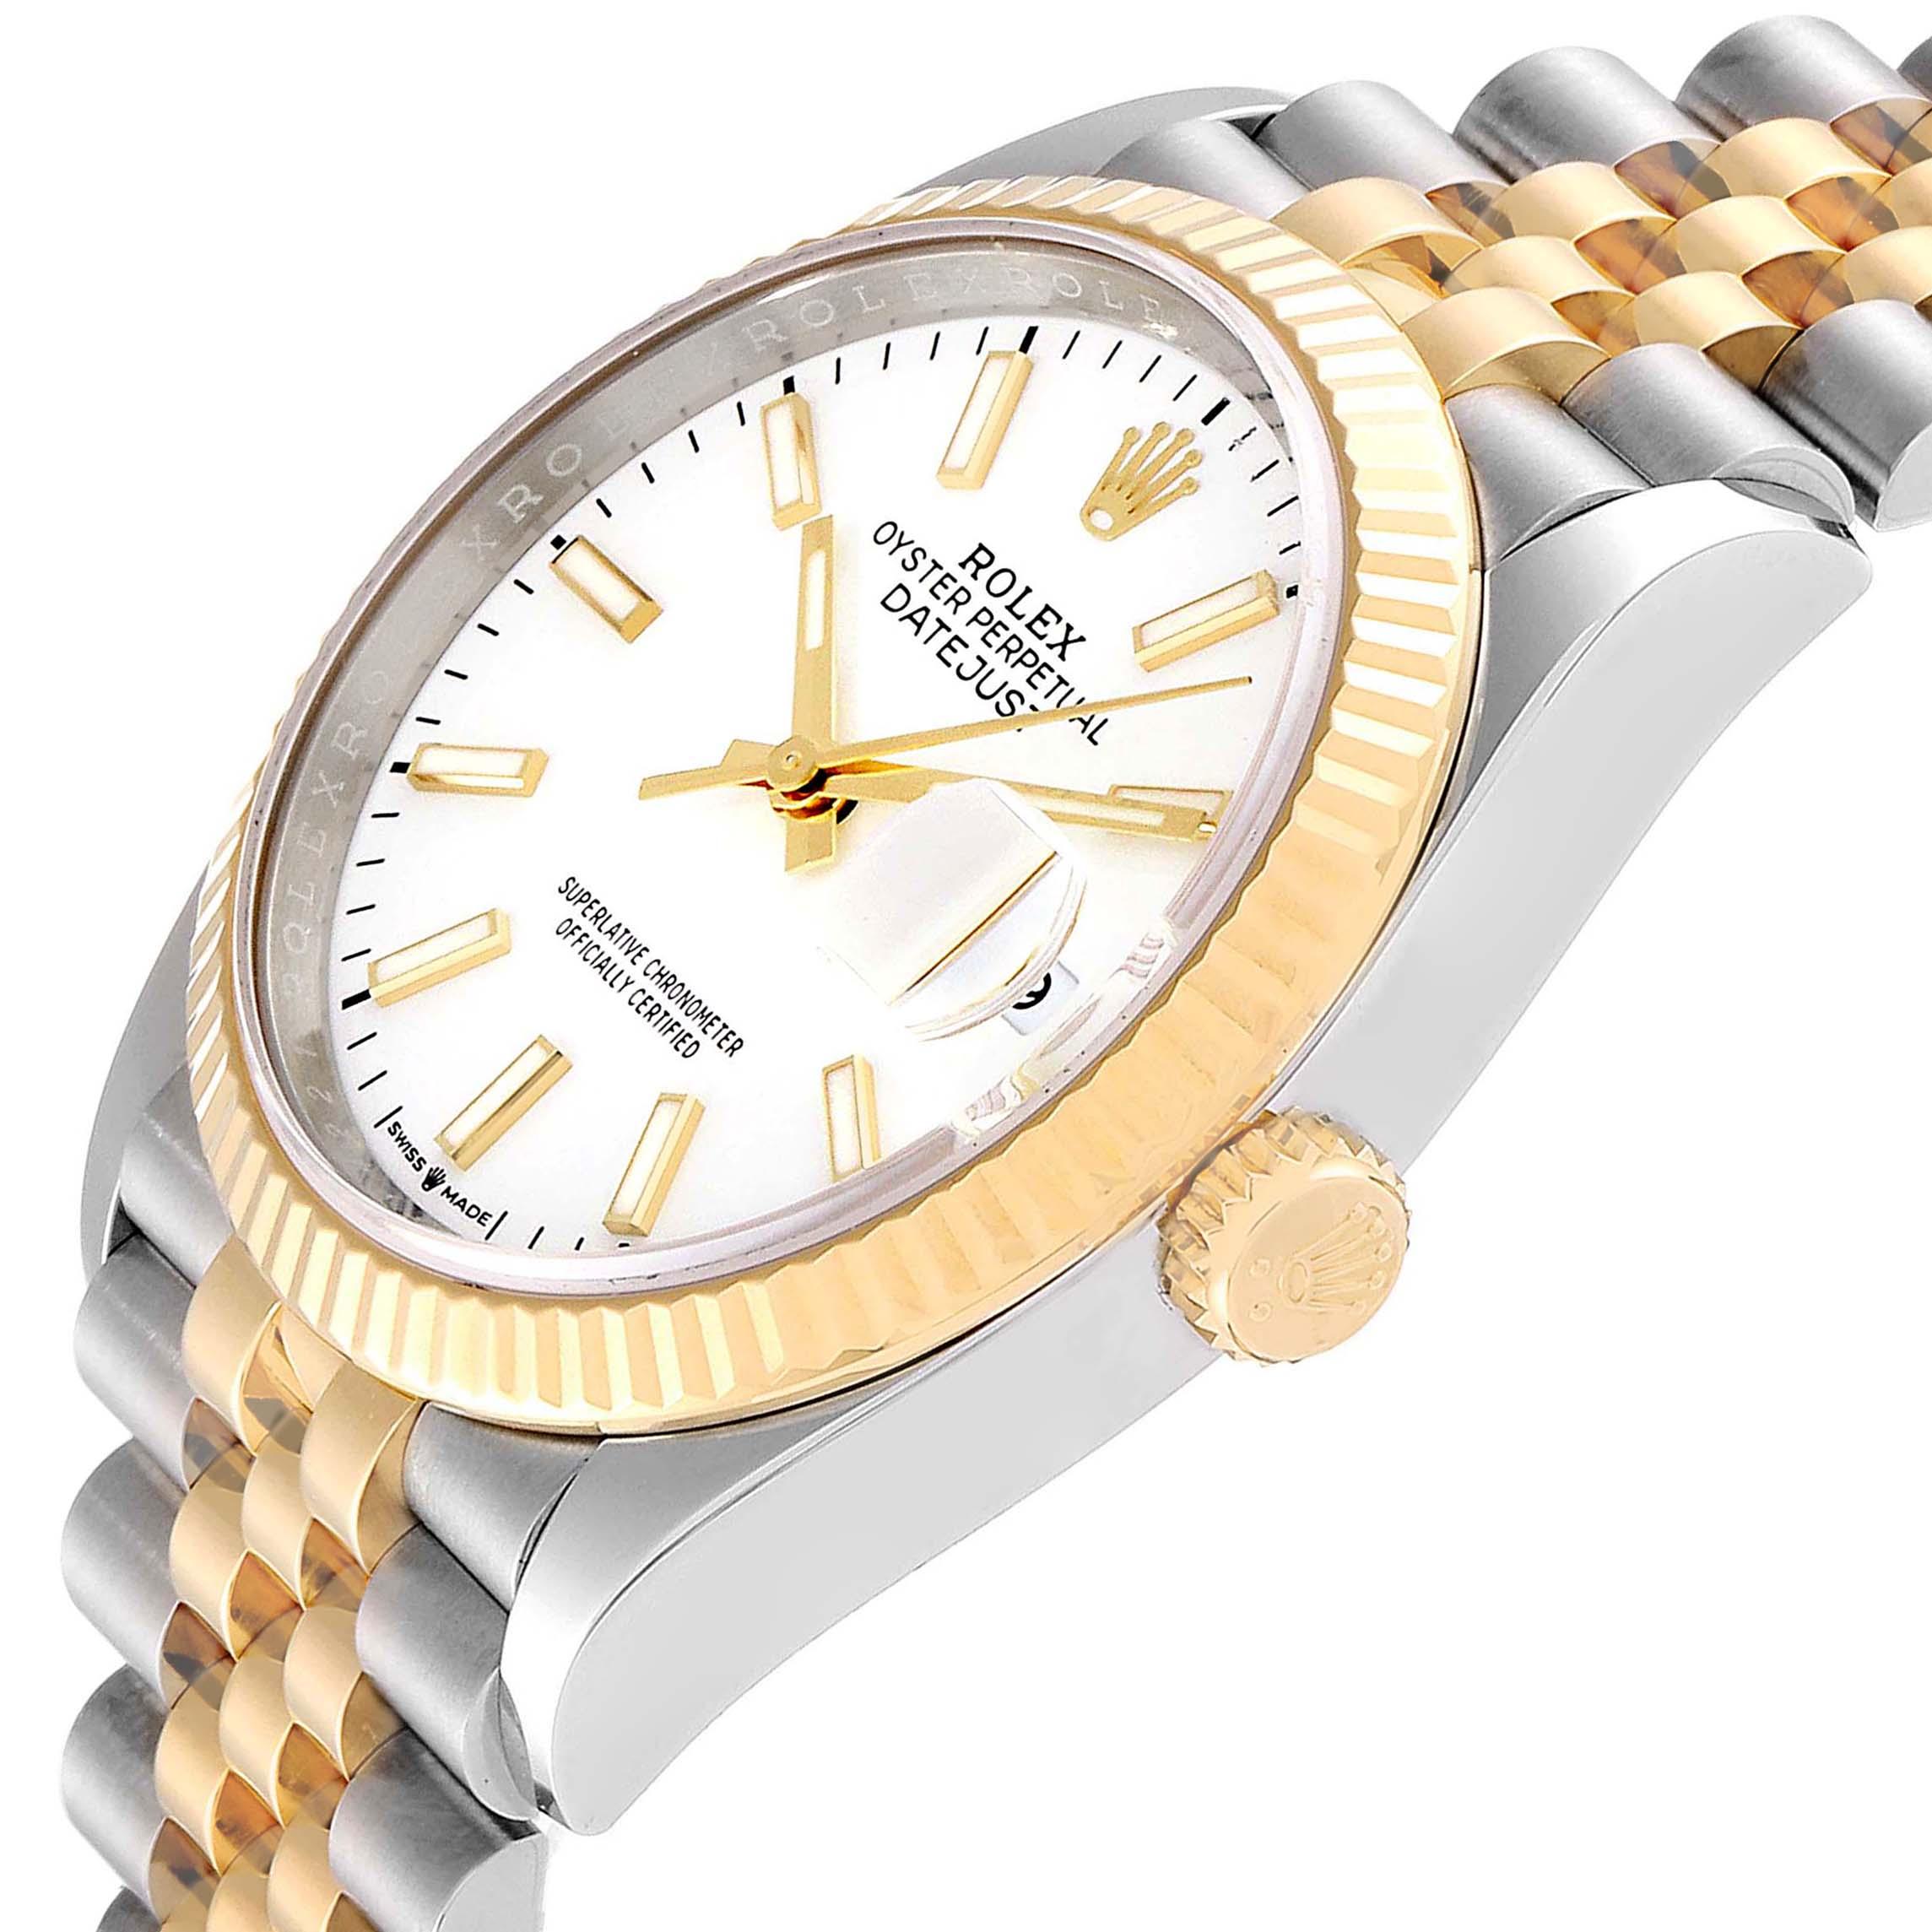 Rolex Datejust Steel Yellow Gold Jubilee Bracelet Men's Watch 126233 SwissWatchExpo